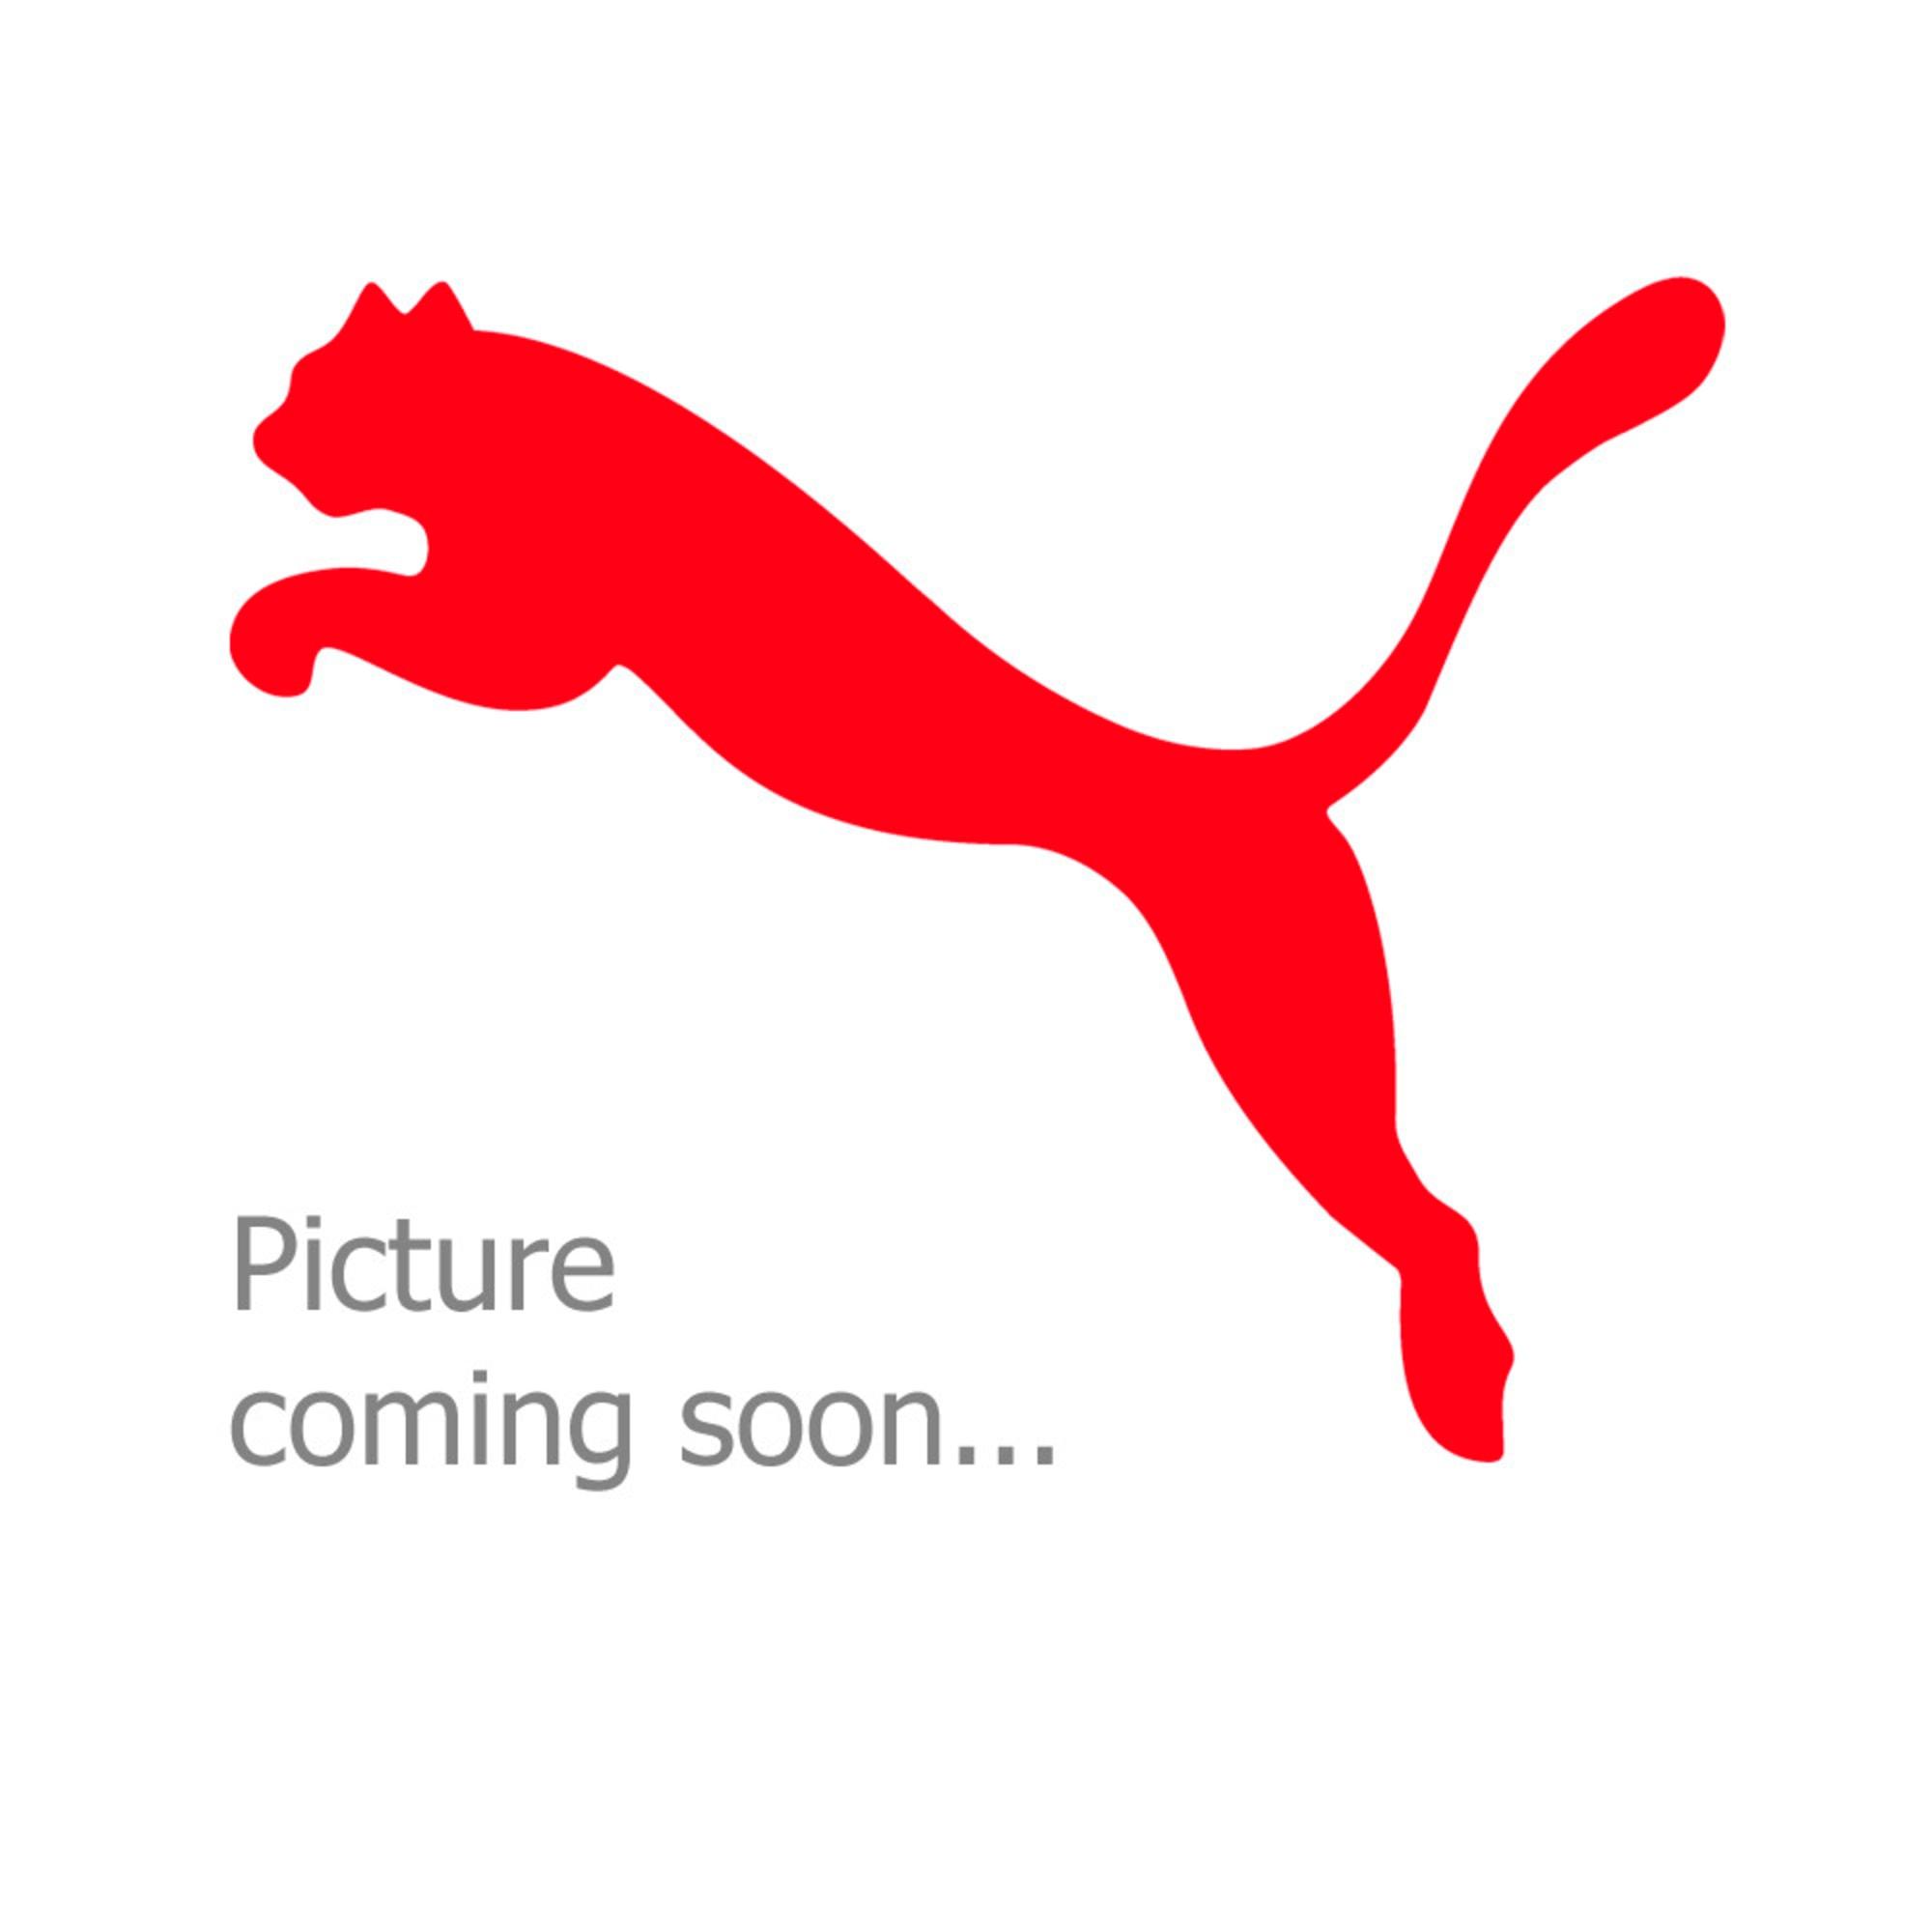 Thumbnail 3 of KING Hero FG Football Boots, Puma Black-Puma White, medium-IND